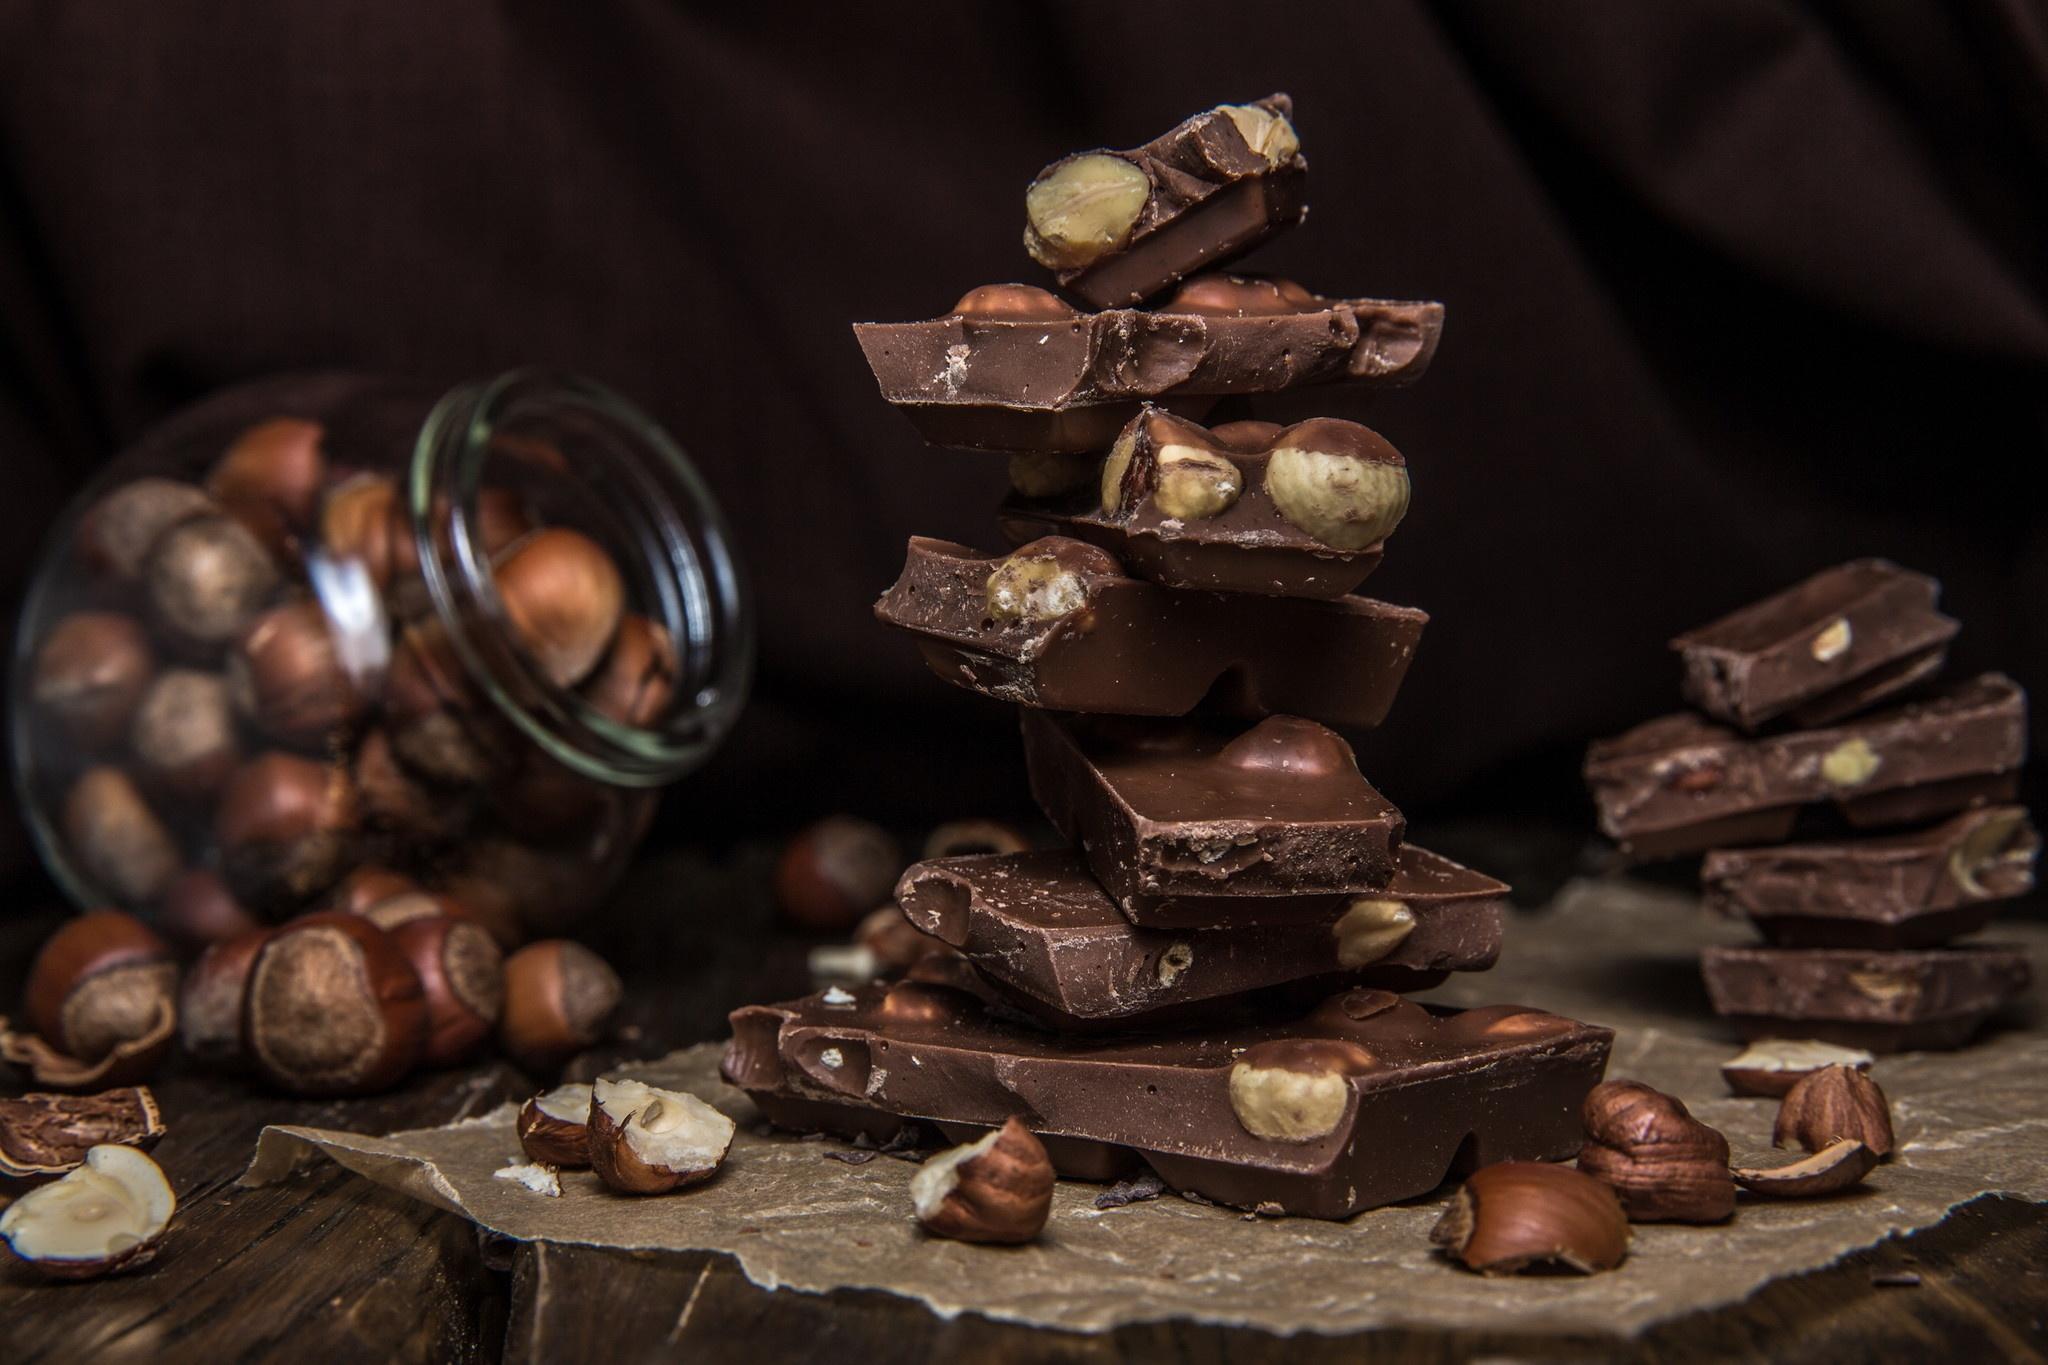 Картинки на денег и шоколадку